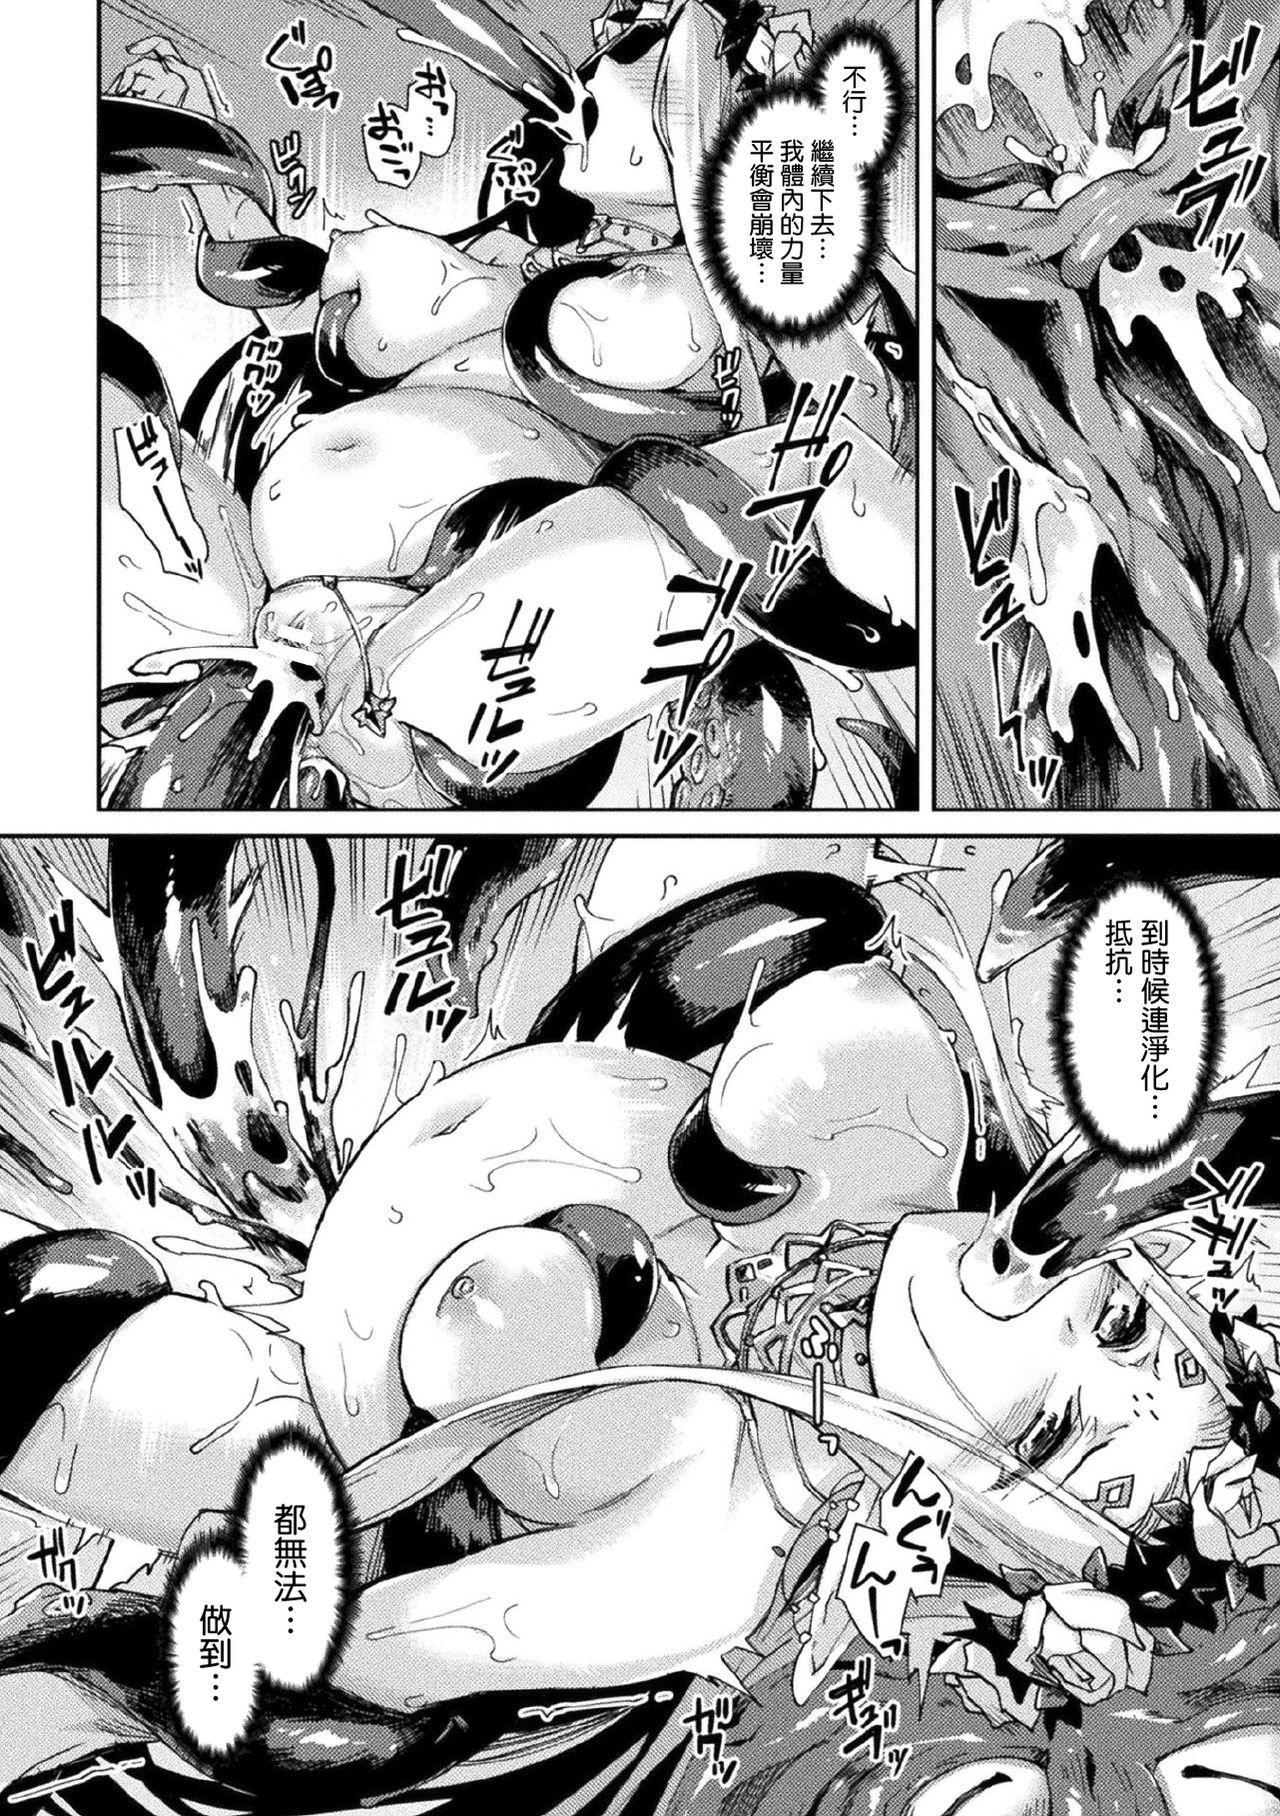 [Tsukitokage] Kuroinu II ~Inyoku ni Somaru Haitoku no Miyako, Futatabi~ THE COMIC Chapter 8 (Kukkoro Heroines Vol. 11) [Digital] [Chinese] [鬼畜王漢化組] [Digital] 18